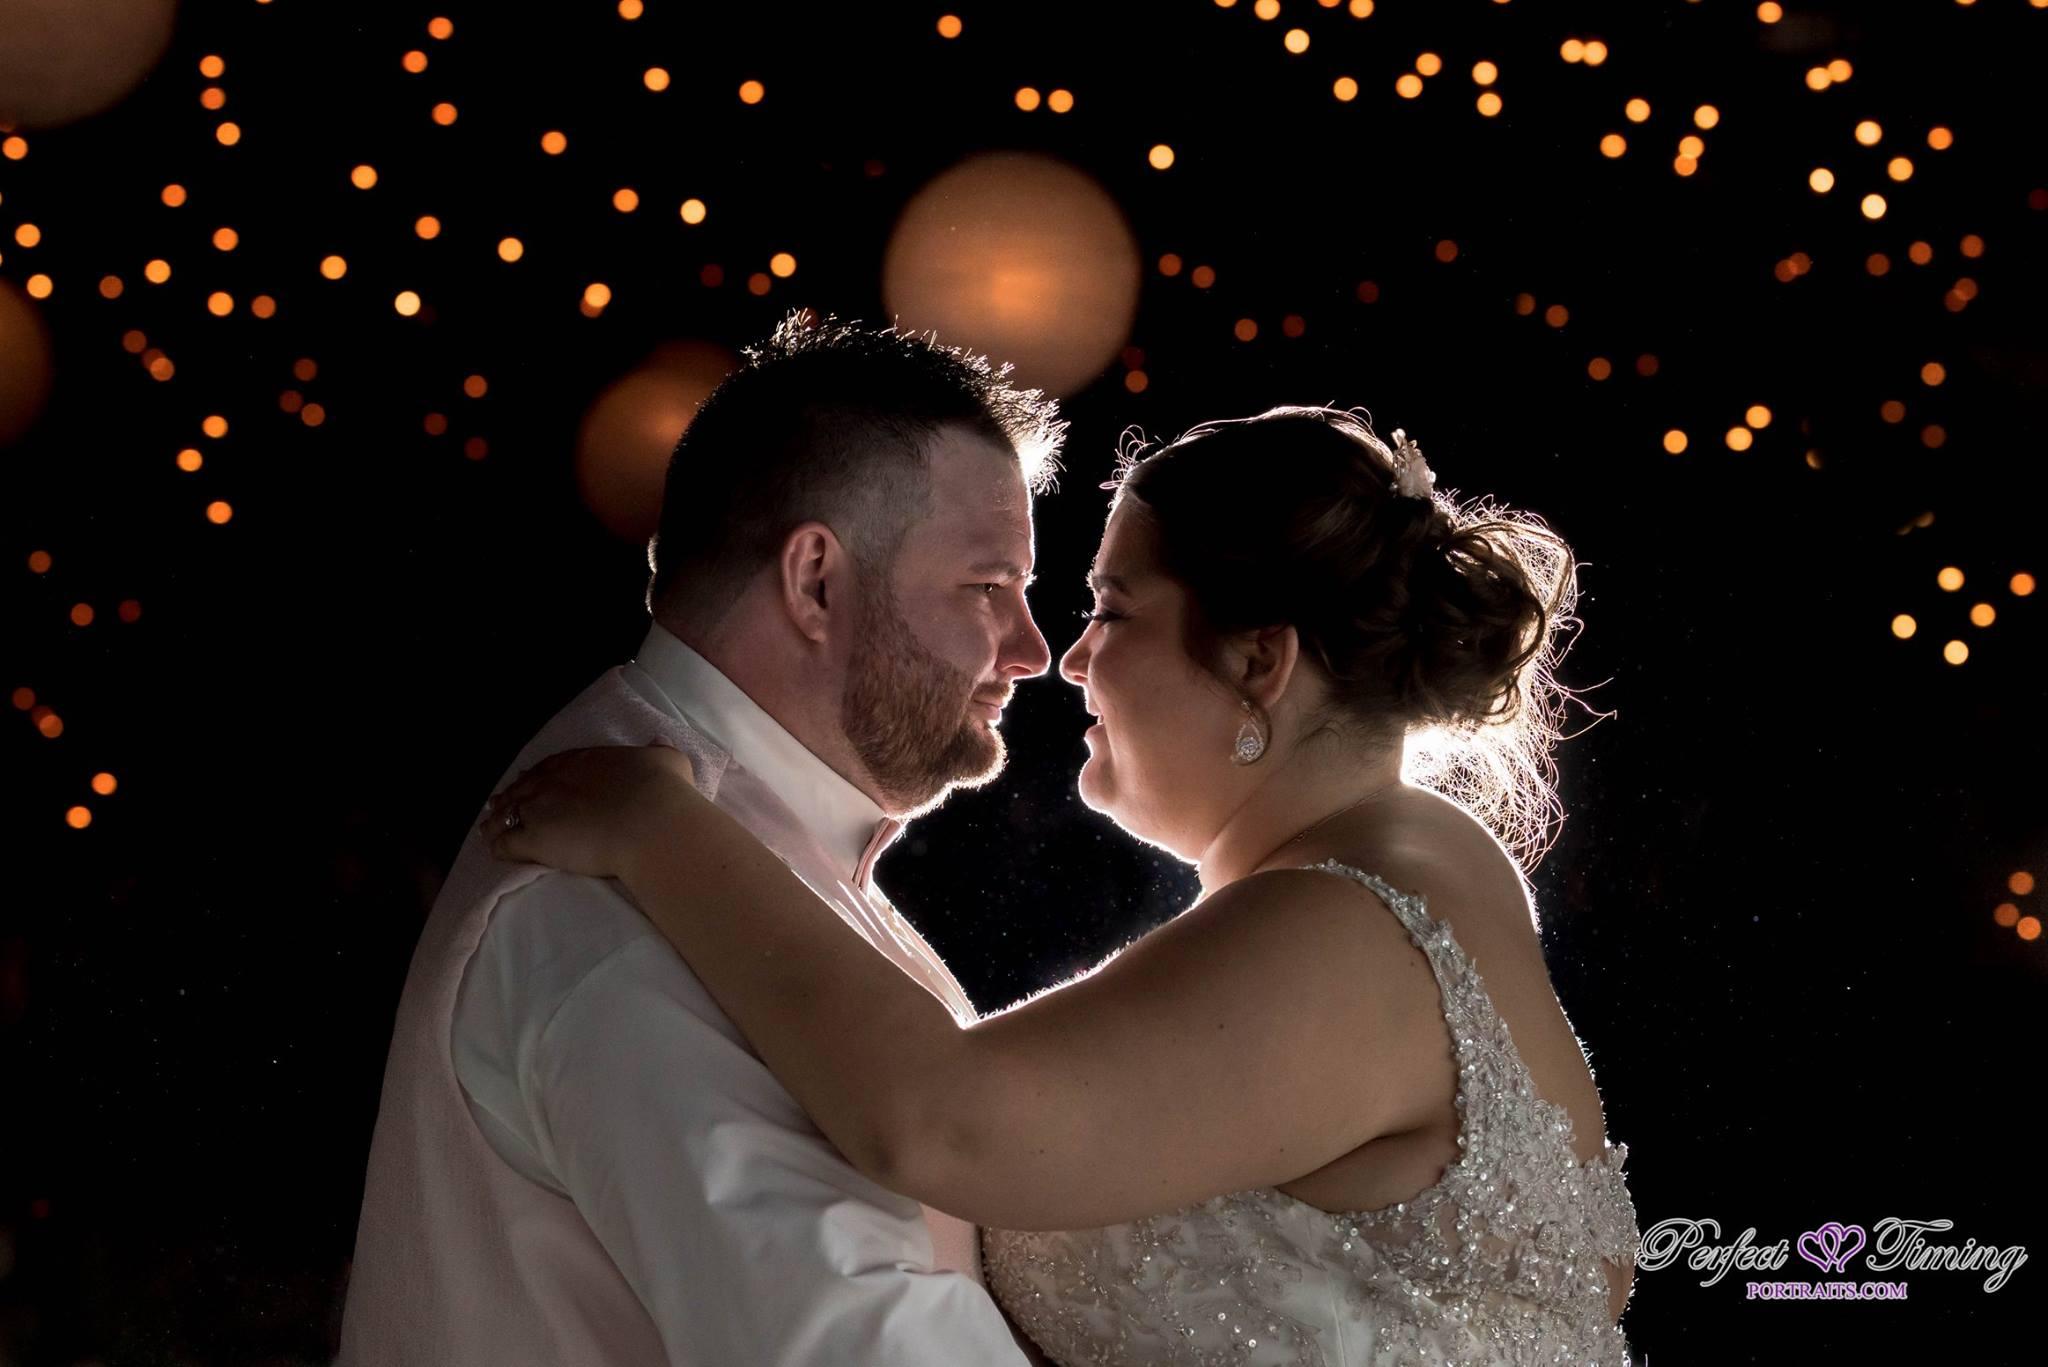 Mr. and Mrs. Ferguson Wedding!